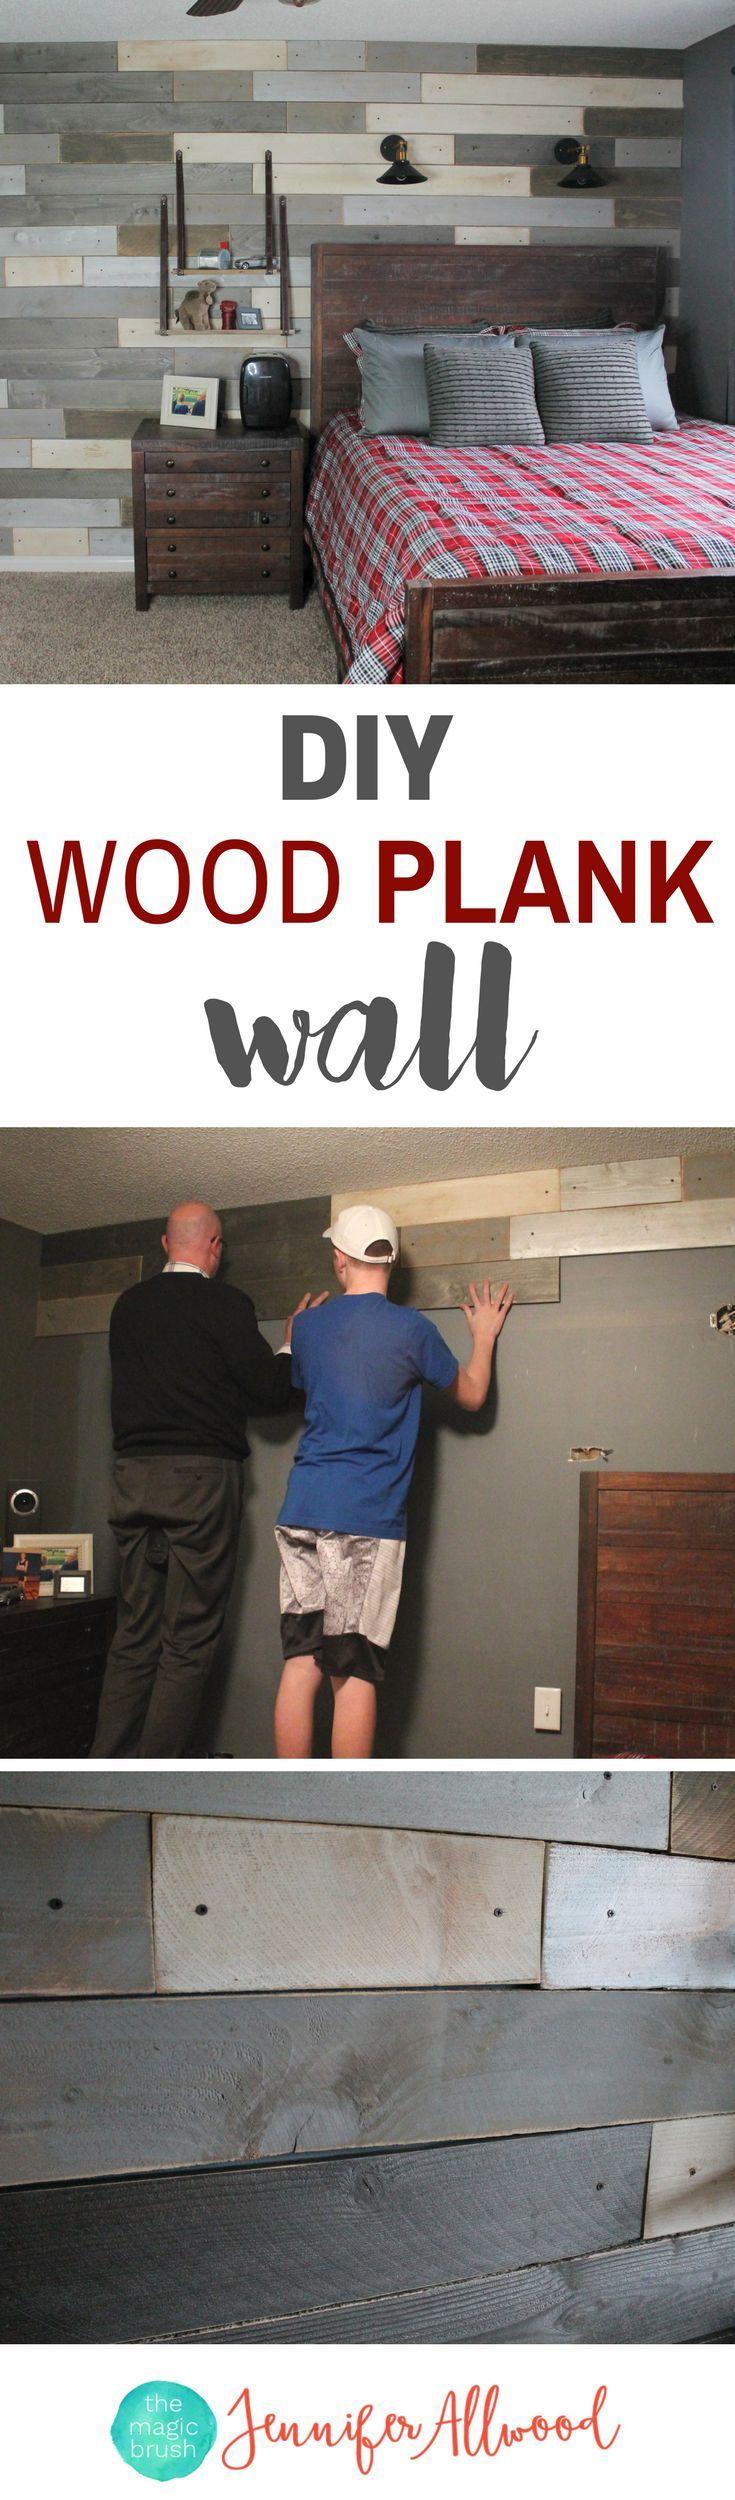 Painted Cedar Wood Plank Wall   Boys Room Decorating Ideas   DIY Accent Walls & Focal Wall   Magic Brush